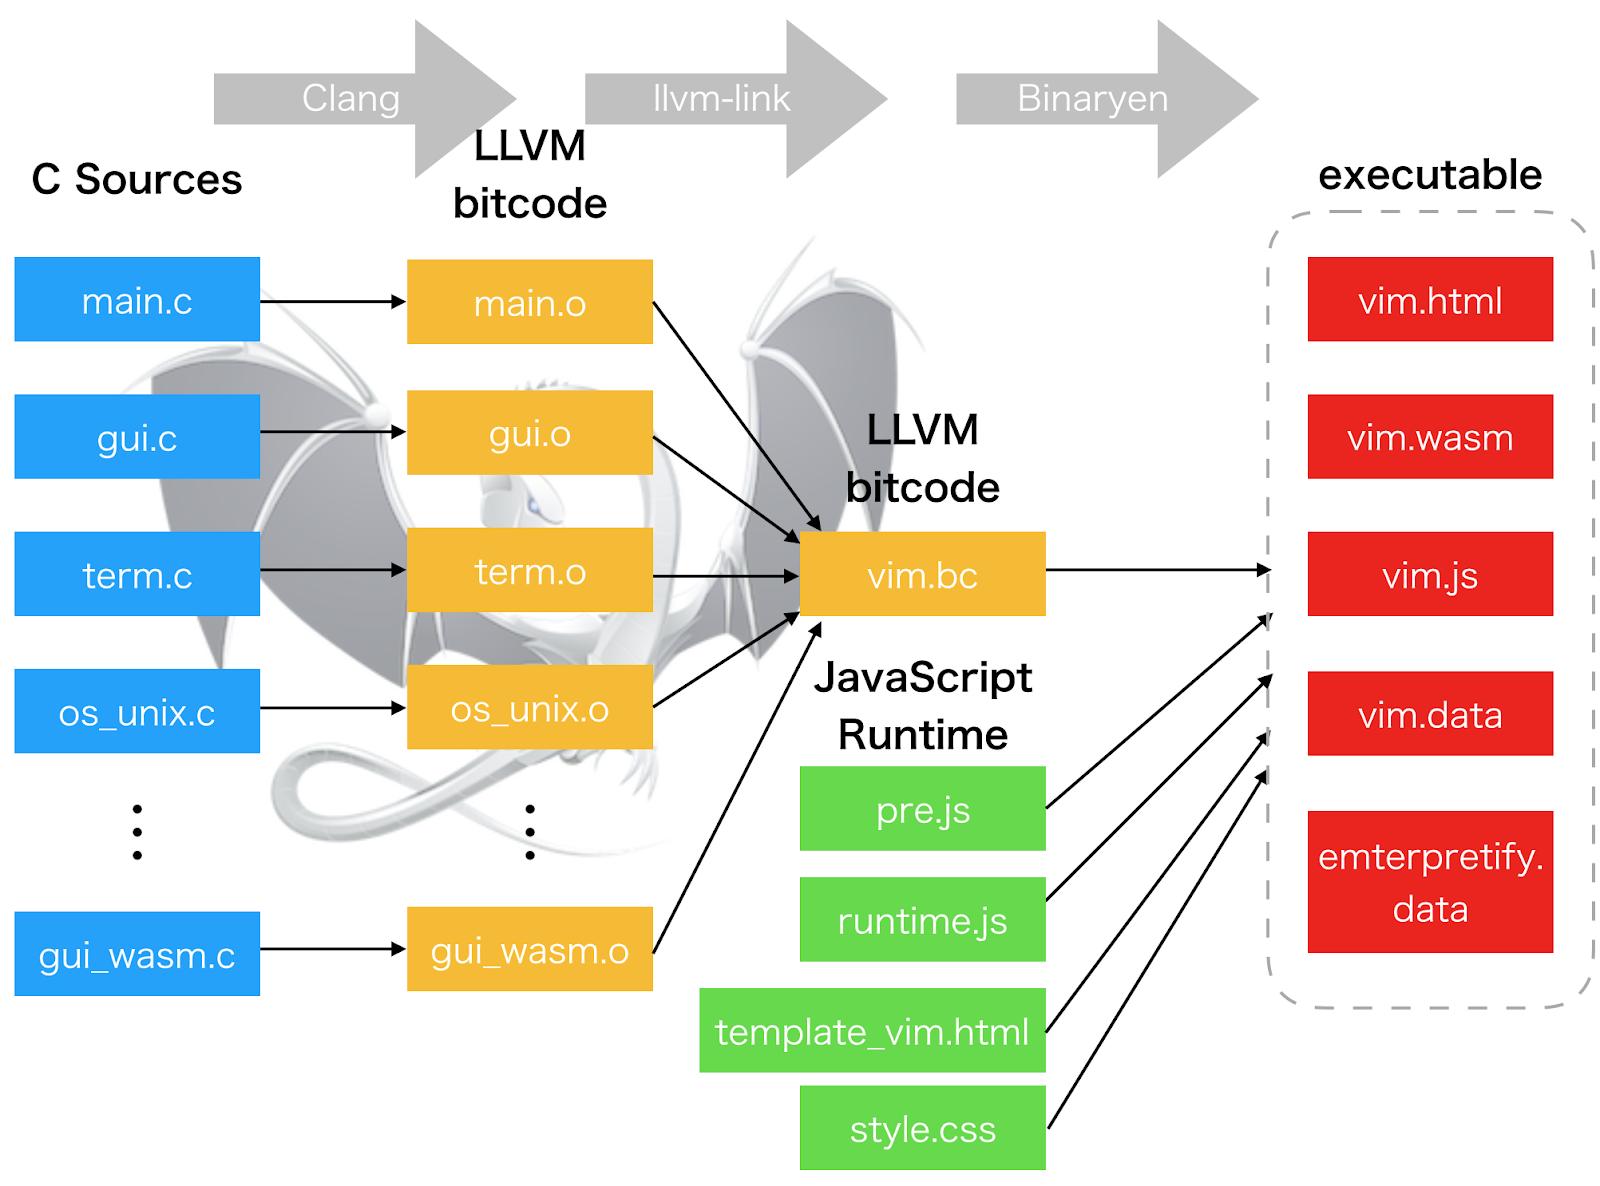 Vim Wasm - Vim Editor Ported To WebAssembly